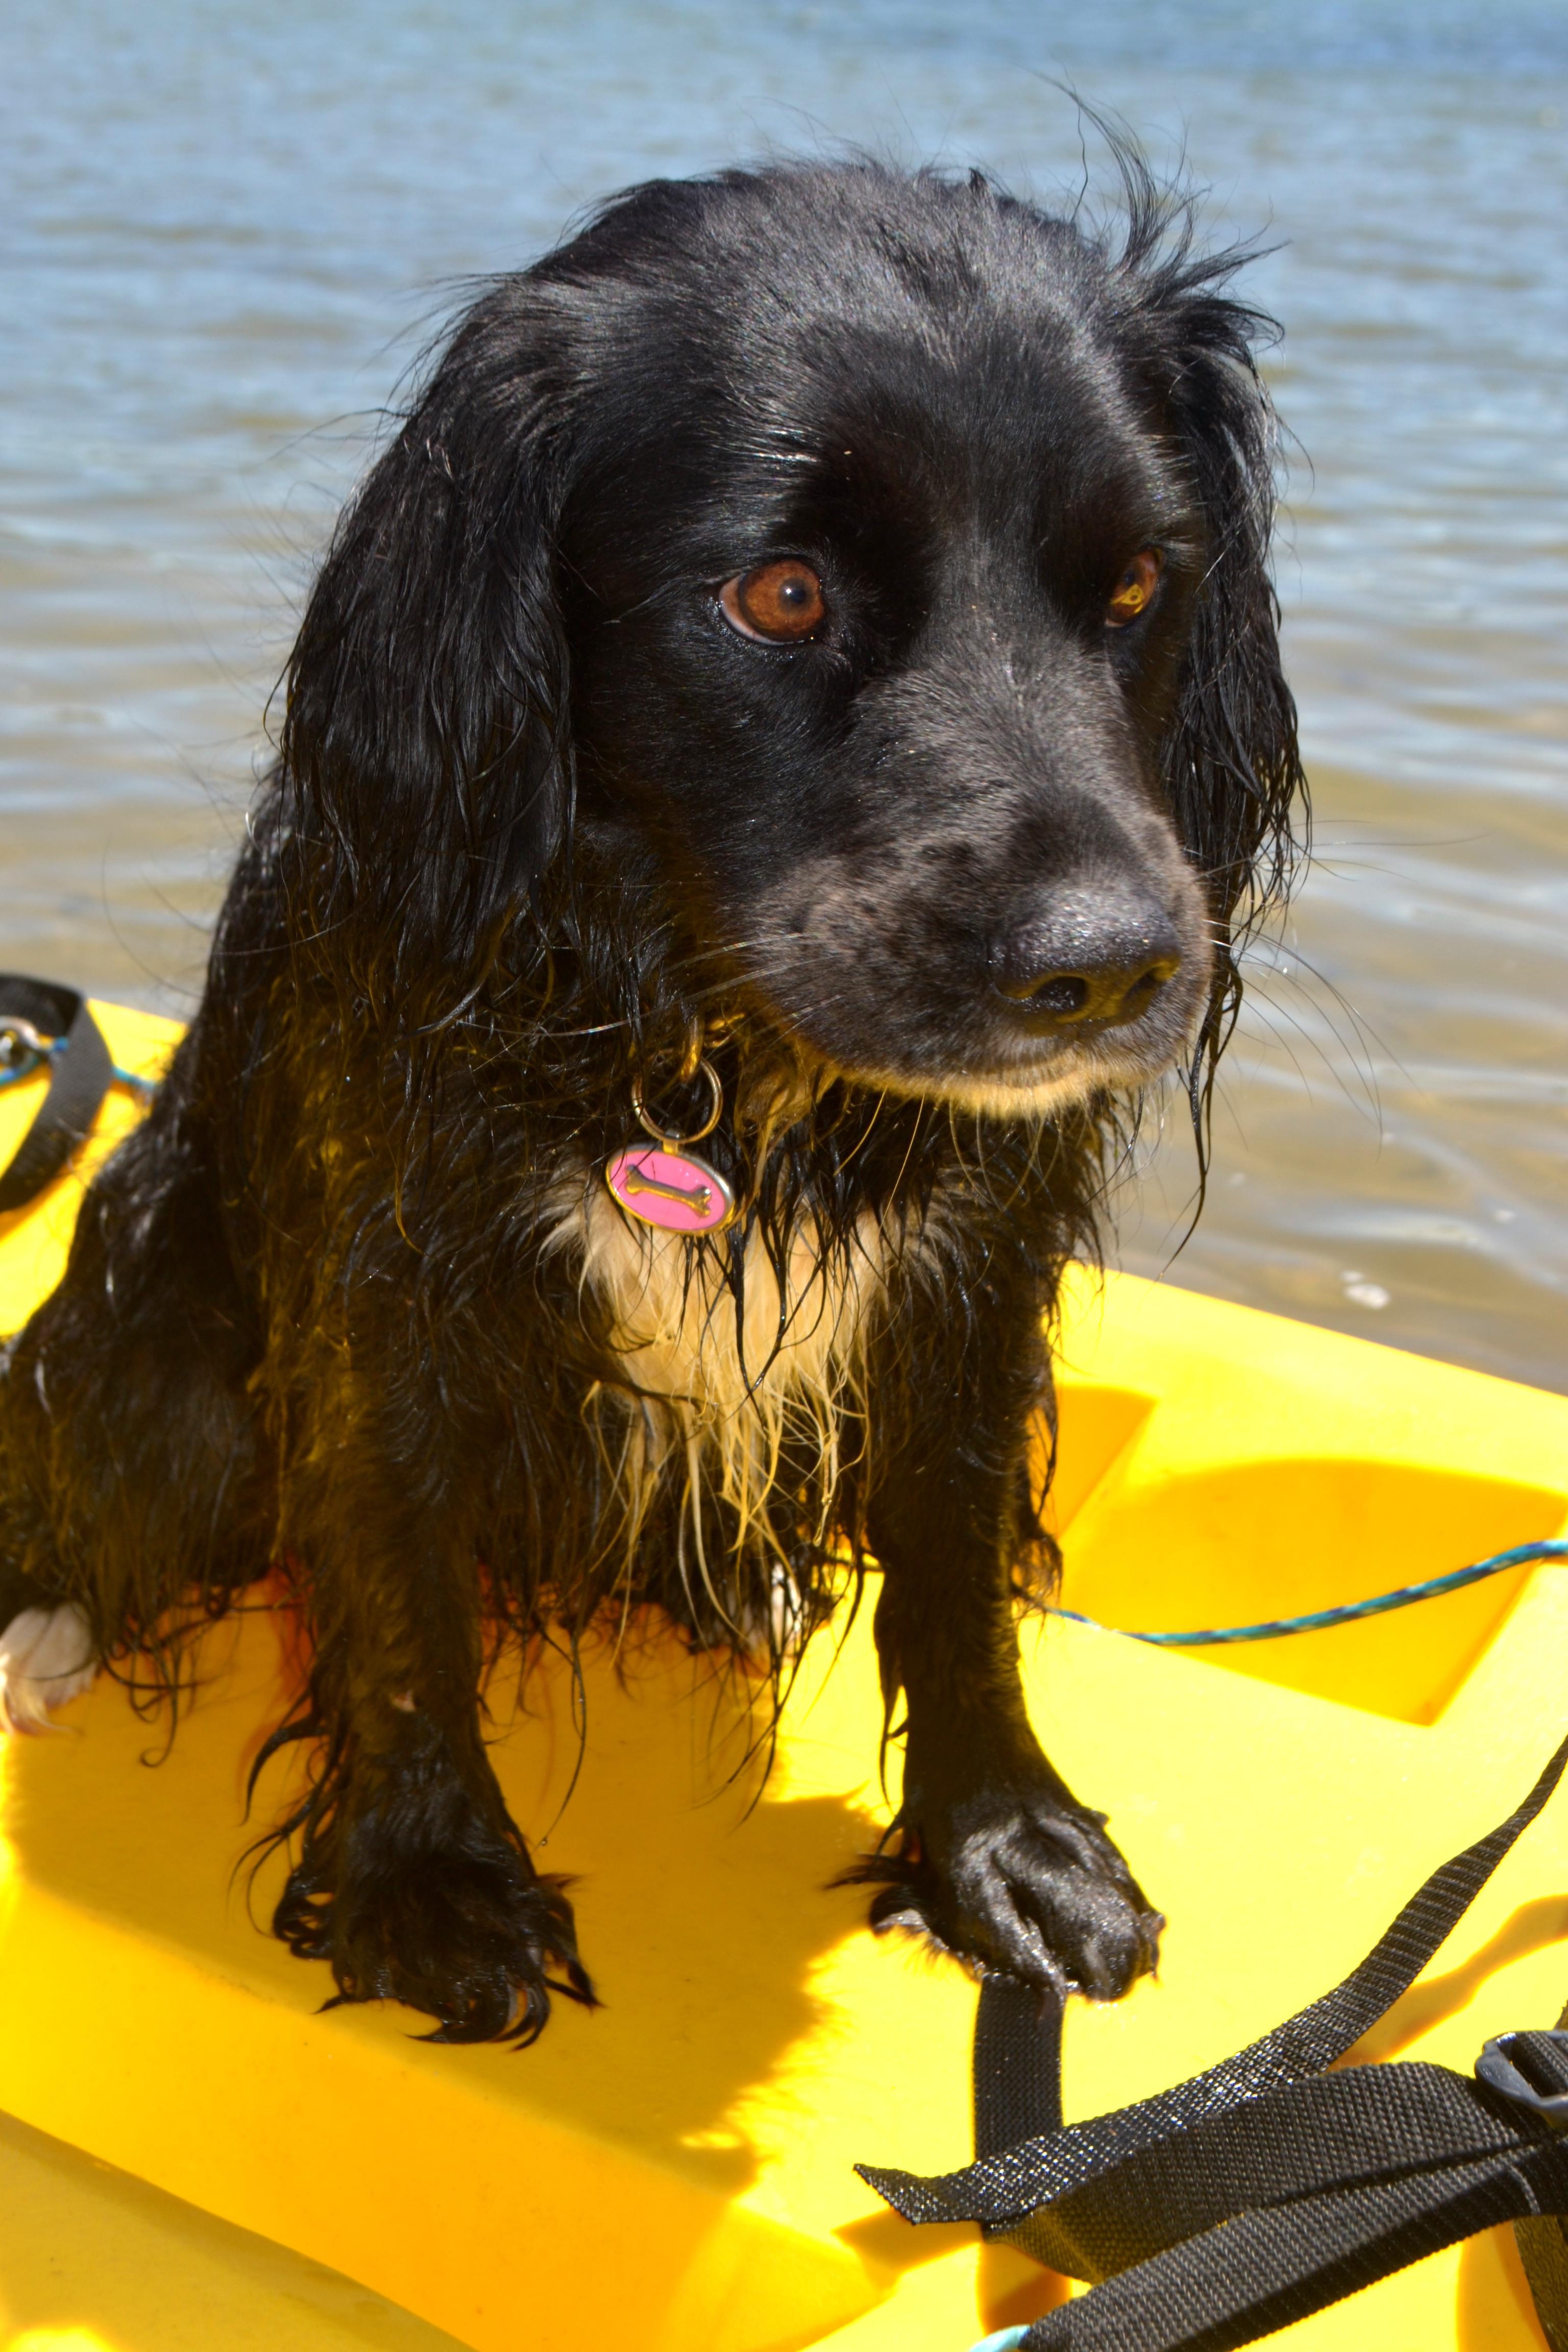 Lady on kayak